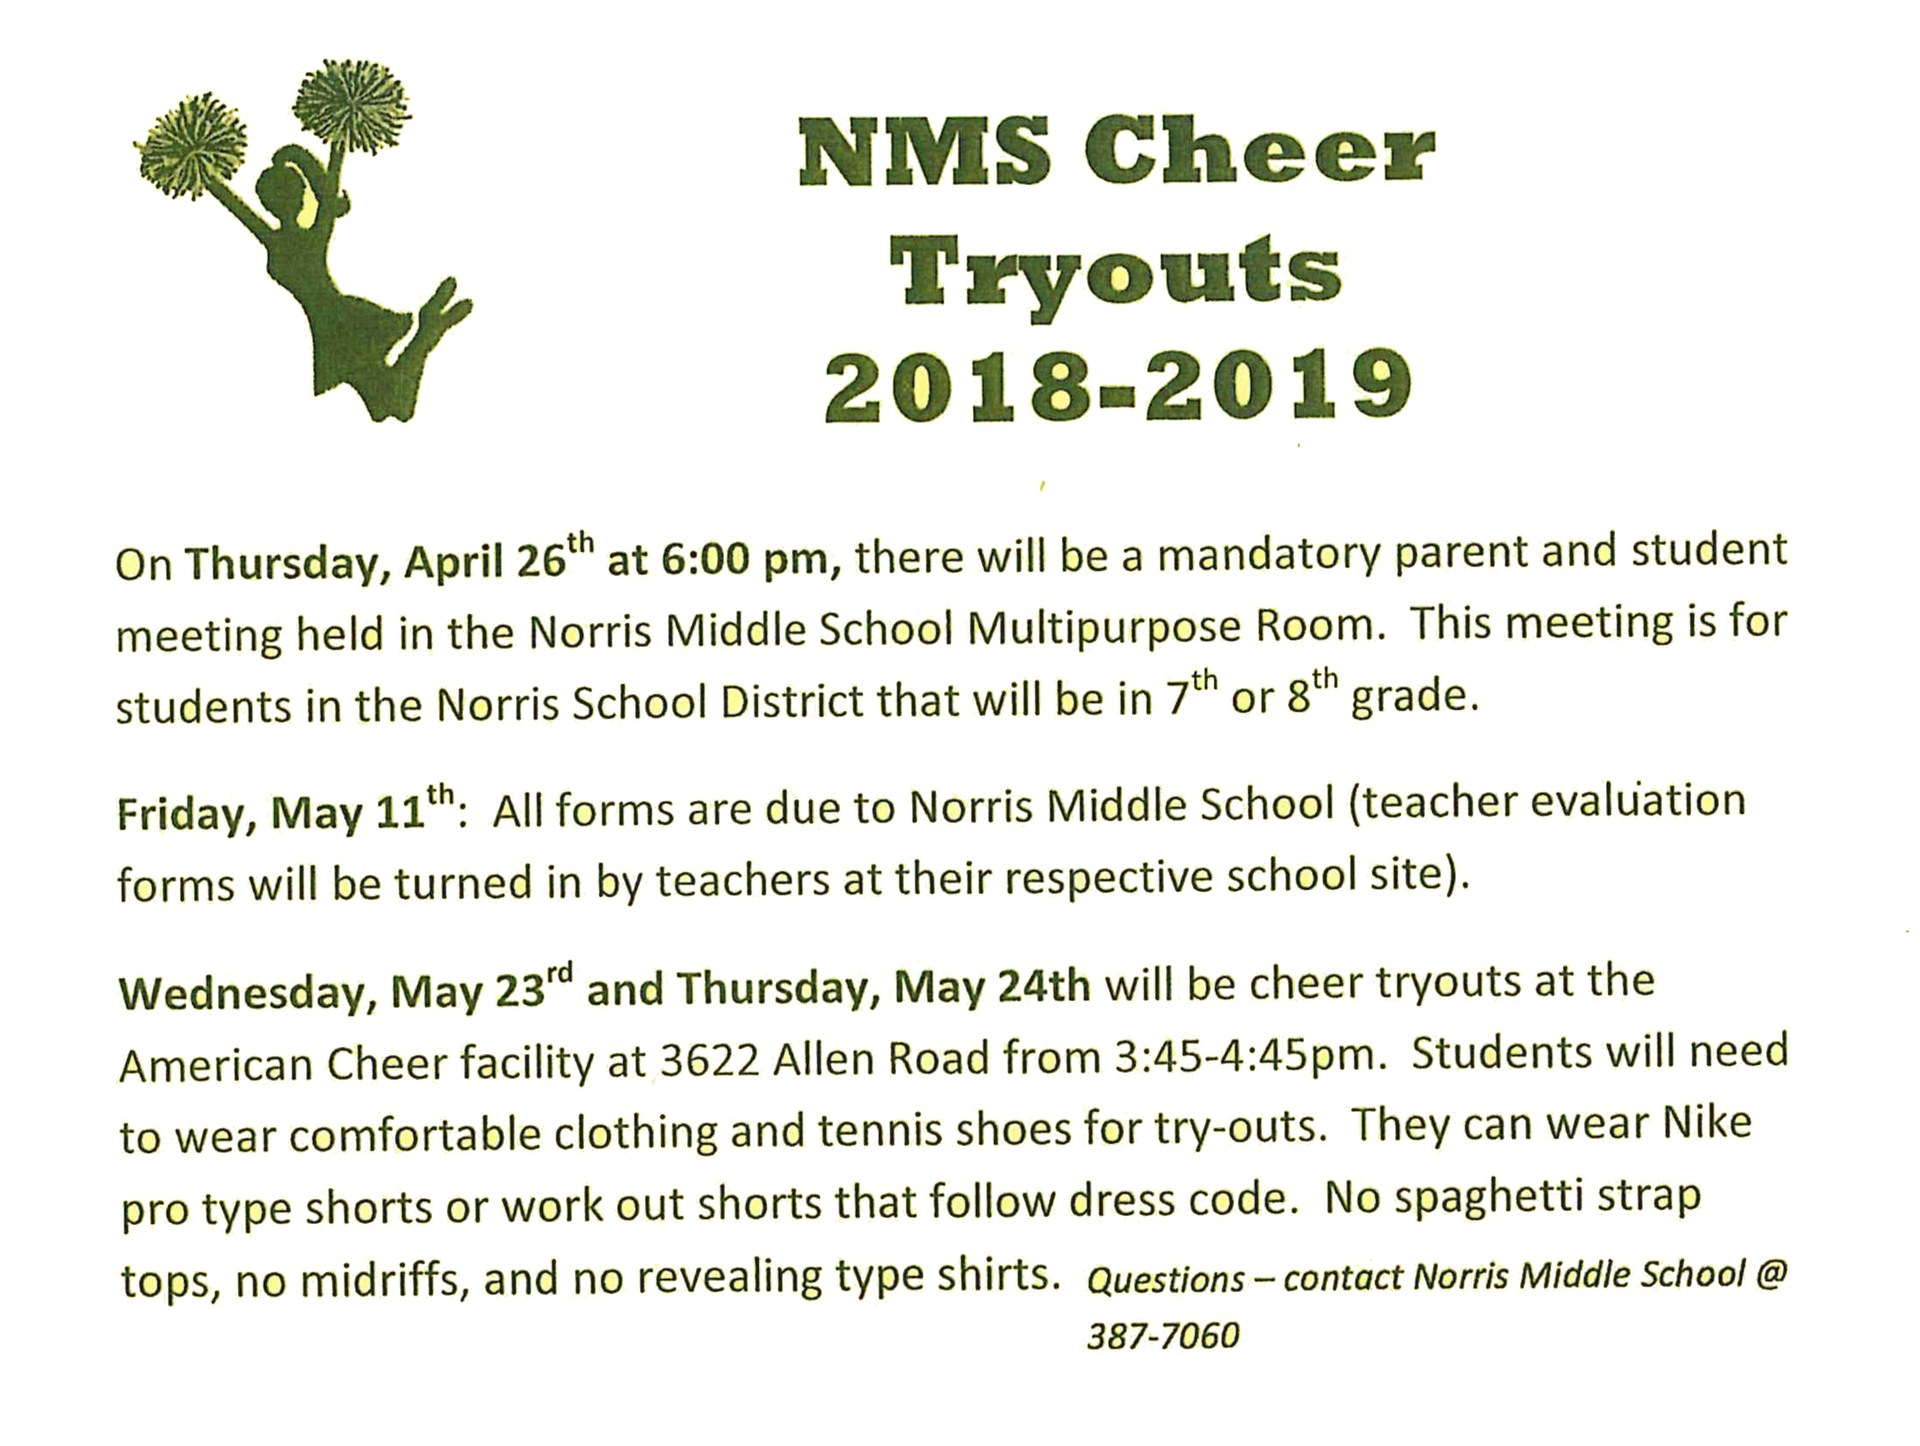 cheer info handout